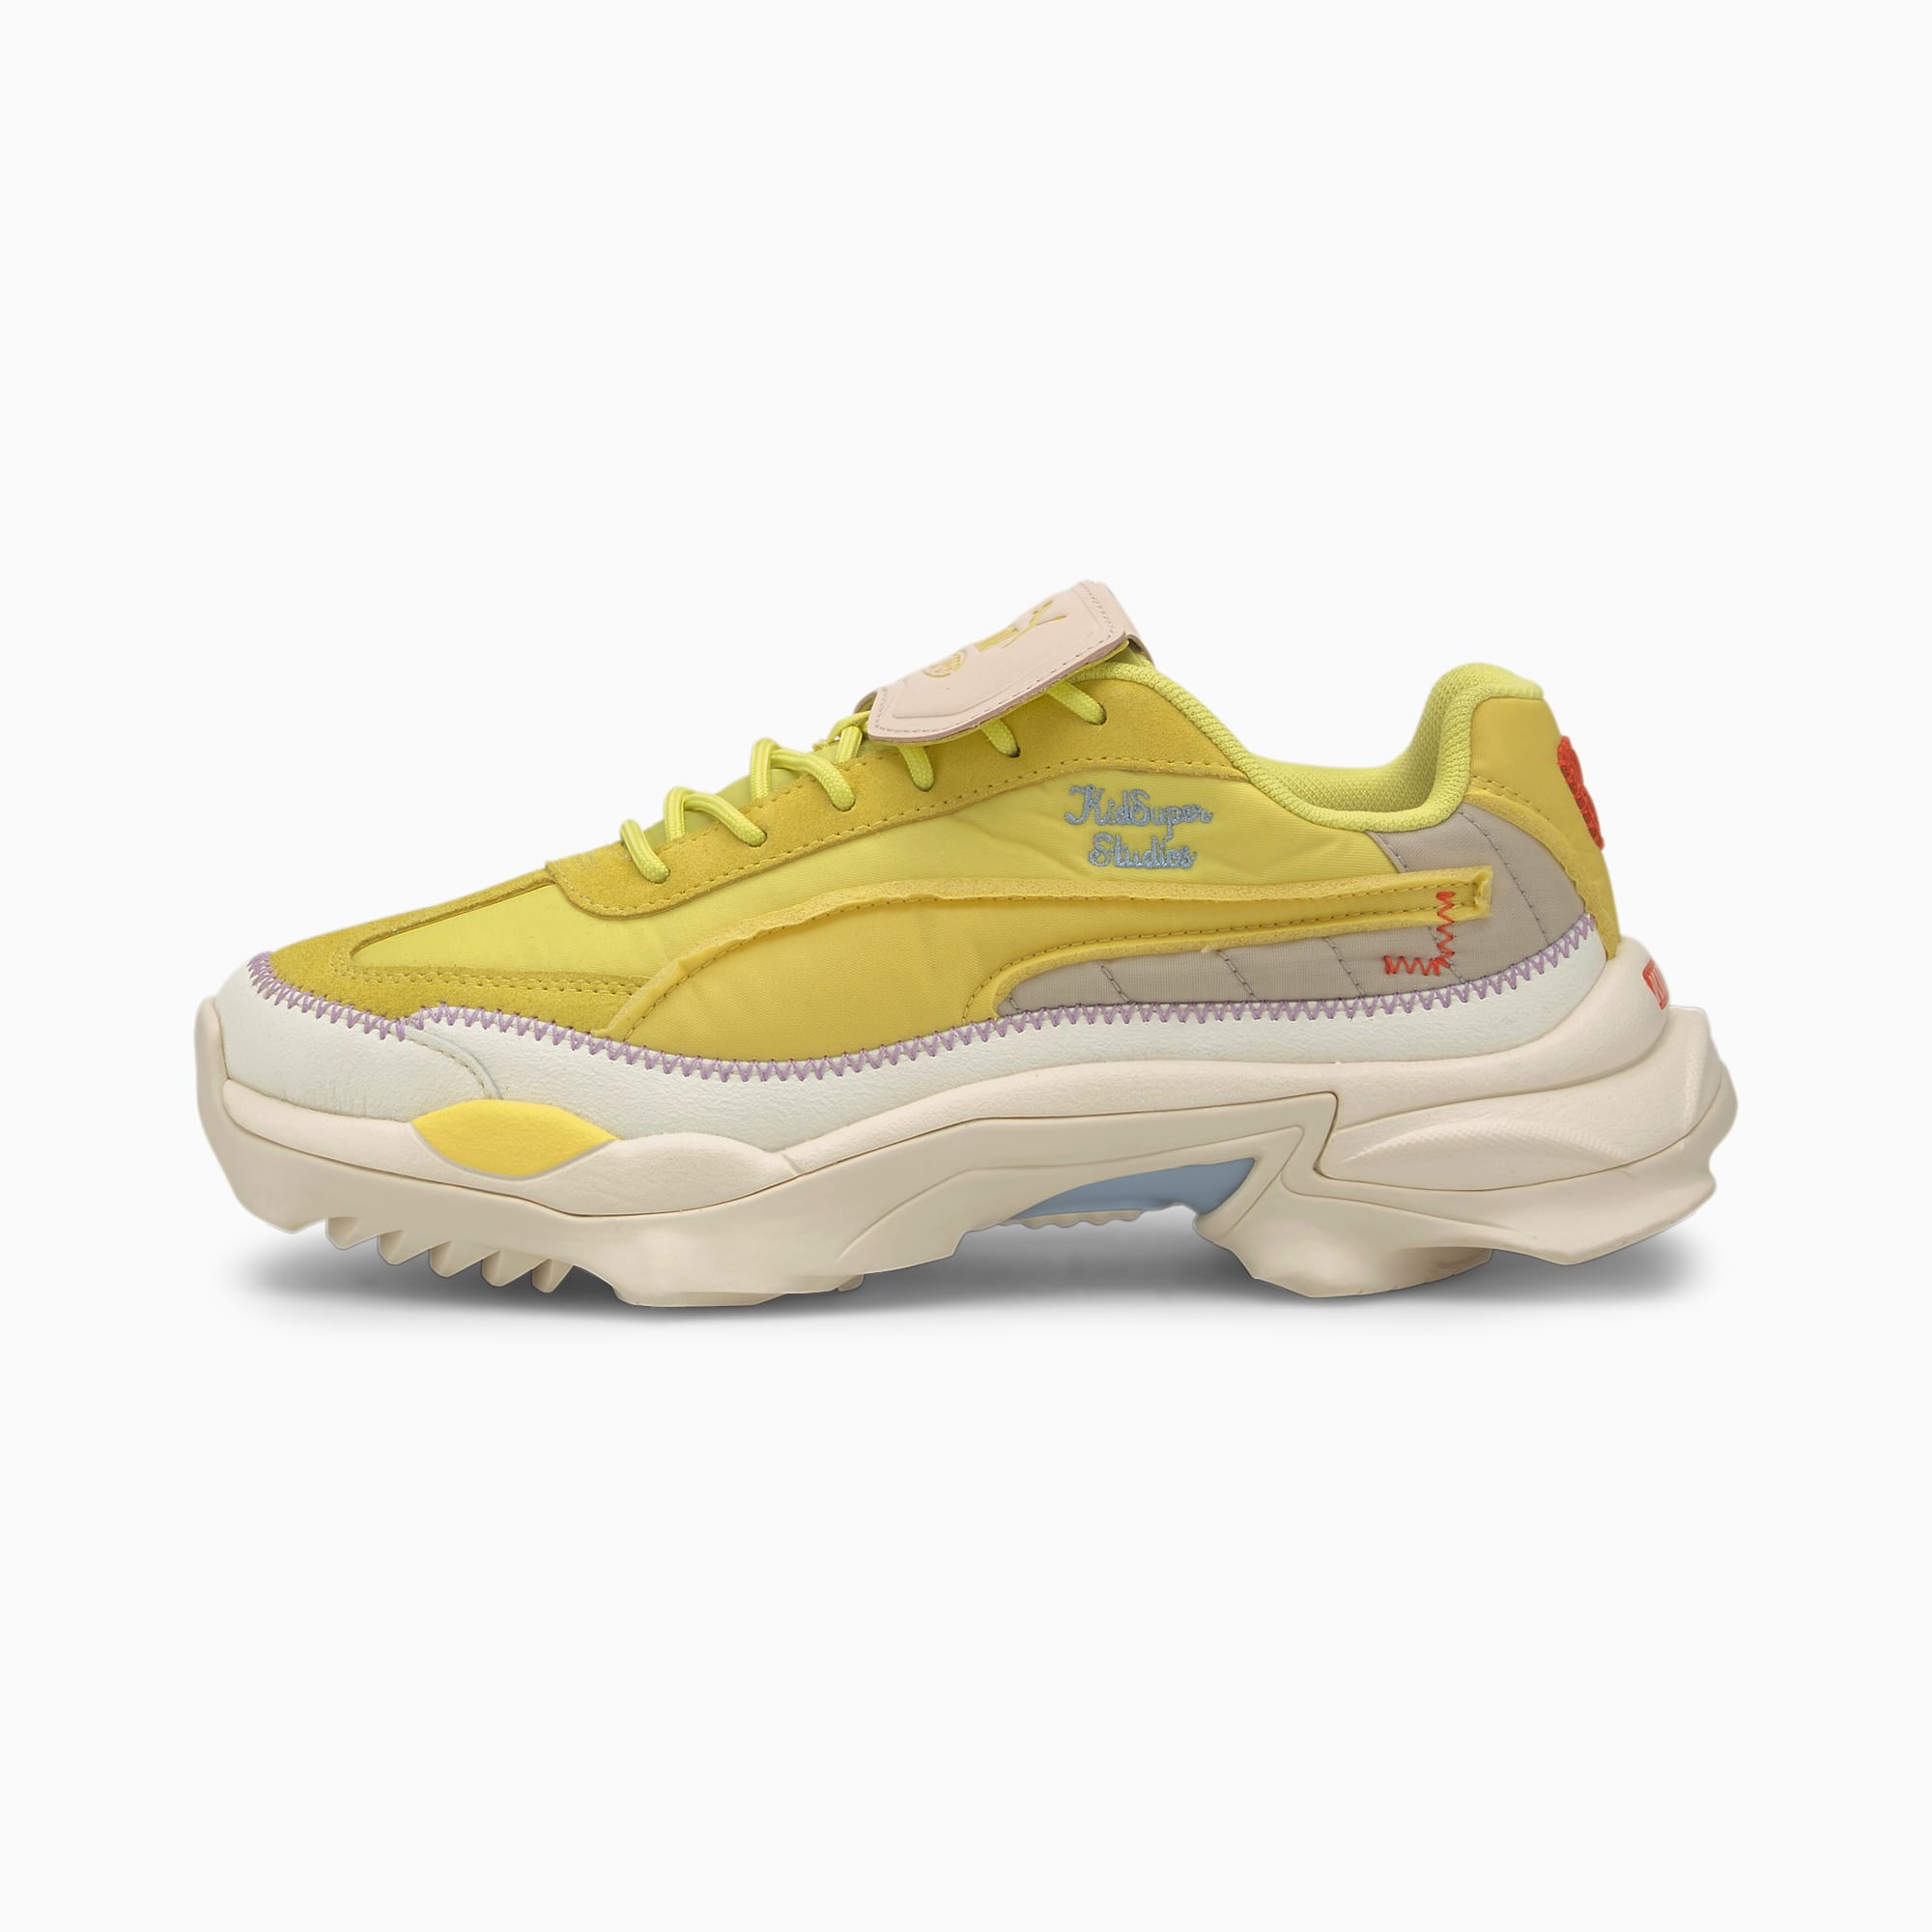 PUMA x KIDSUPER STUDIOS Nitefox Sneakers